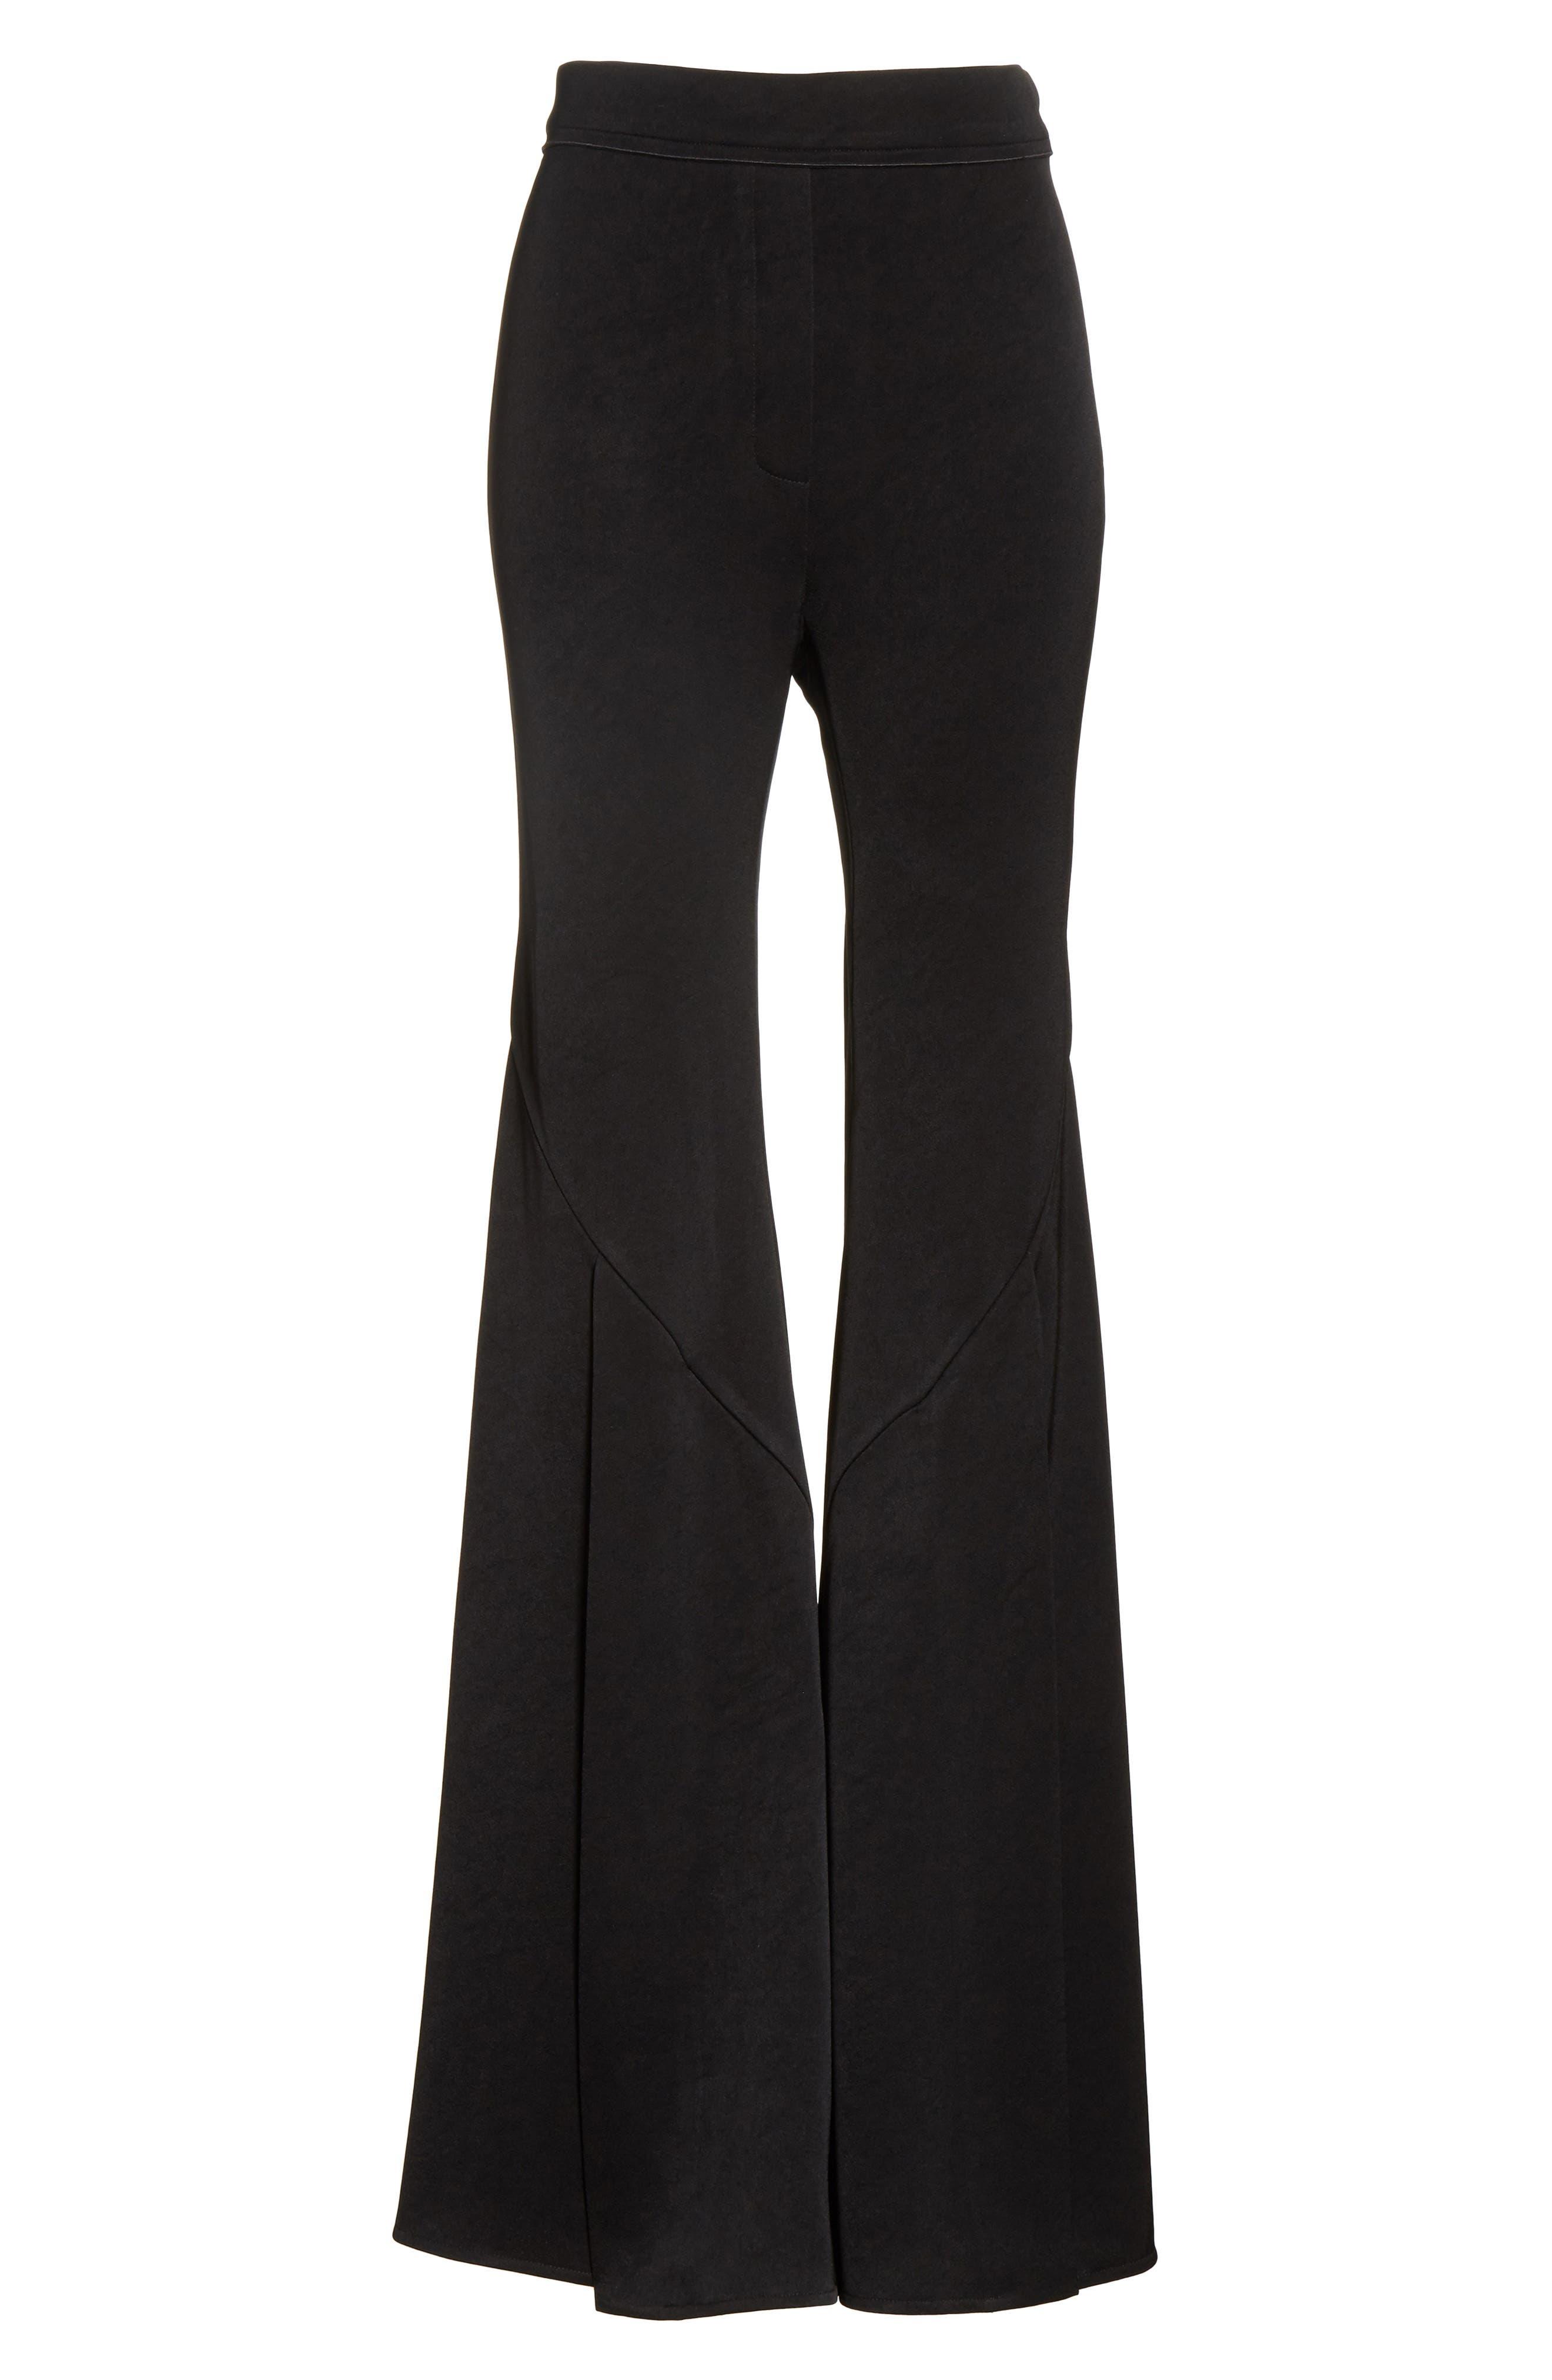 Higher & Higher Wide Flare Leg Pants,                             Alternate thumbnail 6, color,                             Black